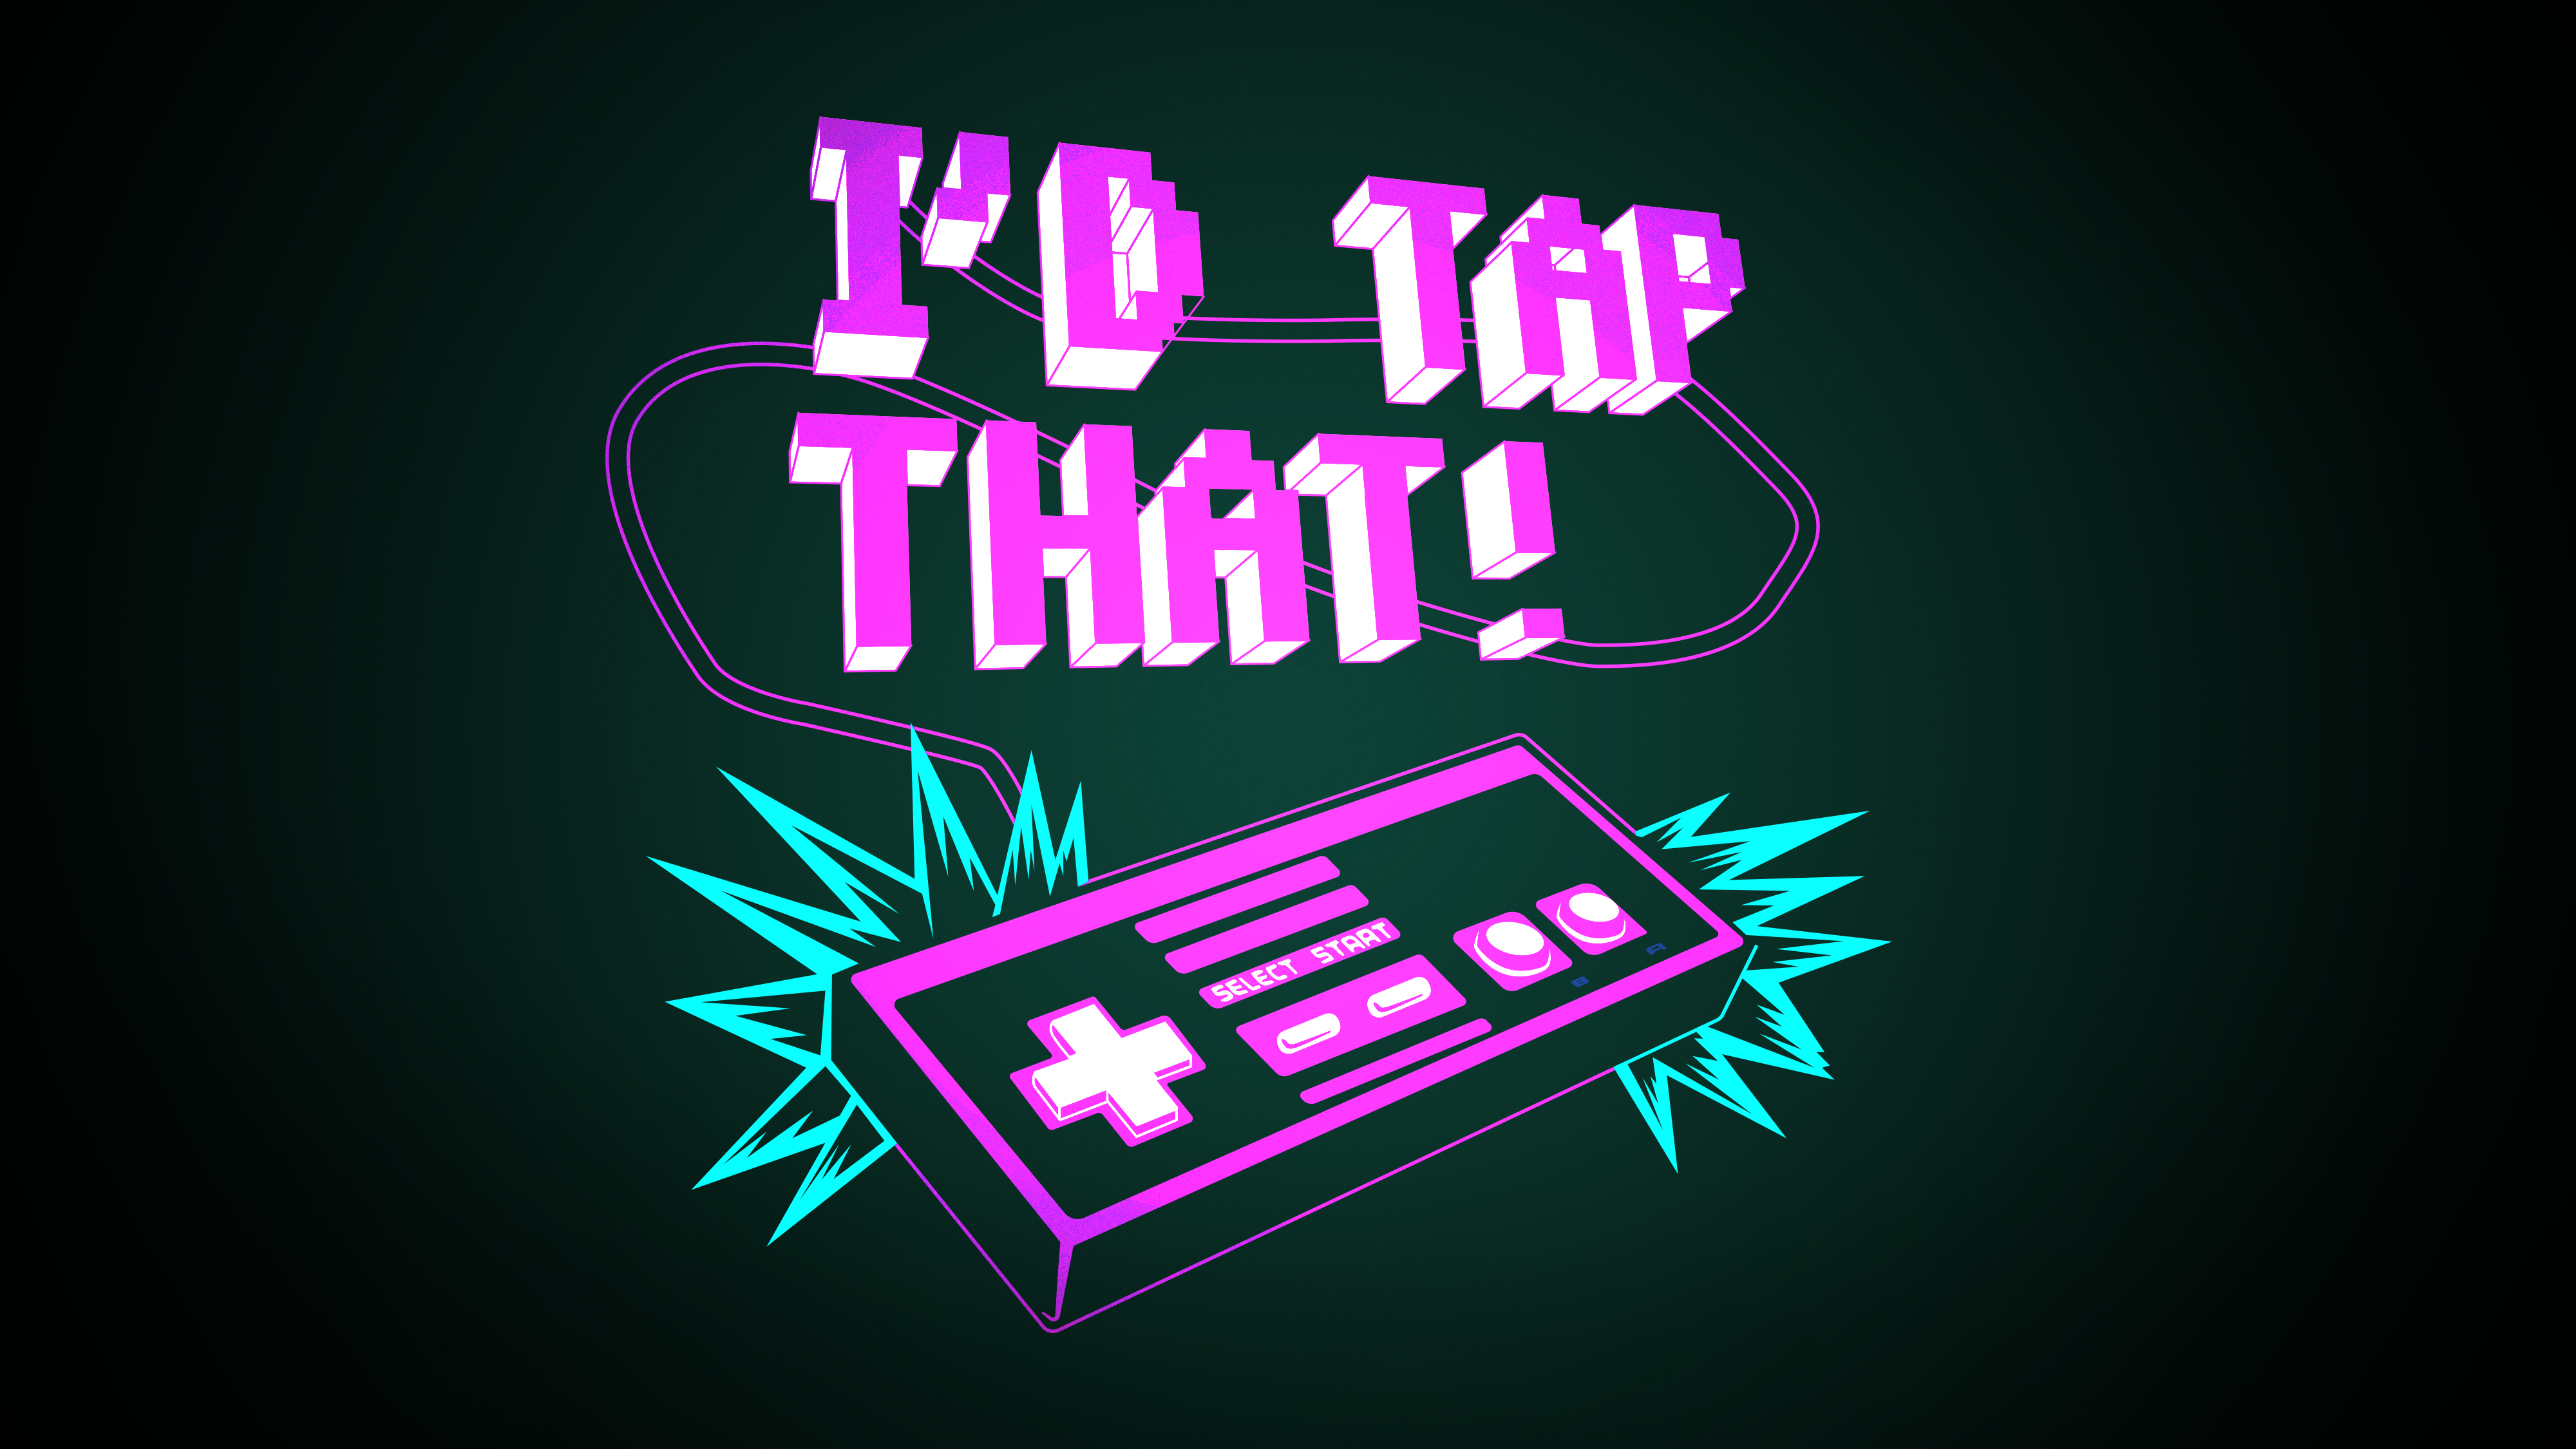 Hd wallpaper tap - Video Game Artistic Video Game Statement Controller Wallpaper